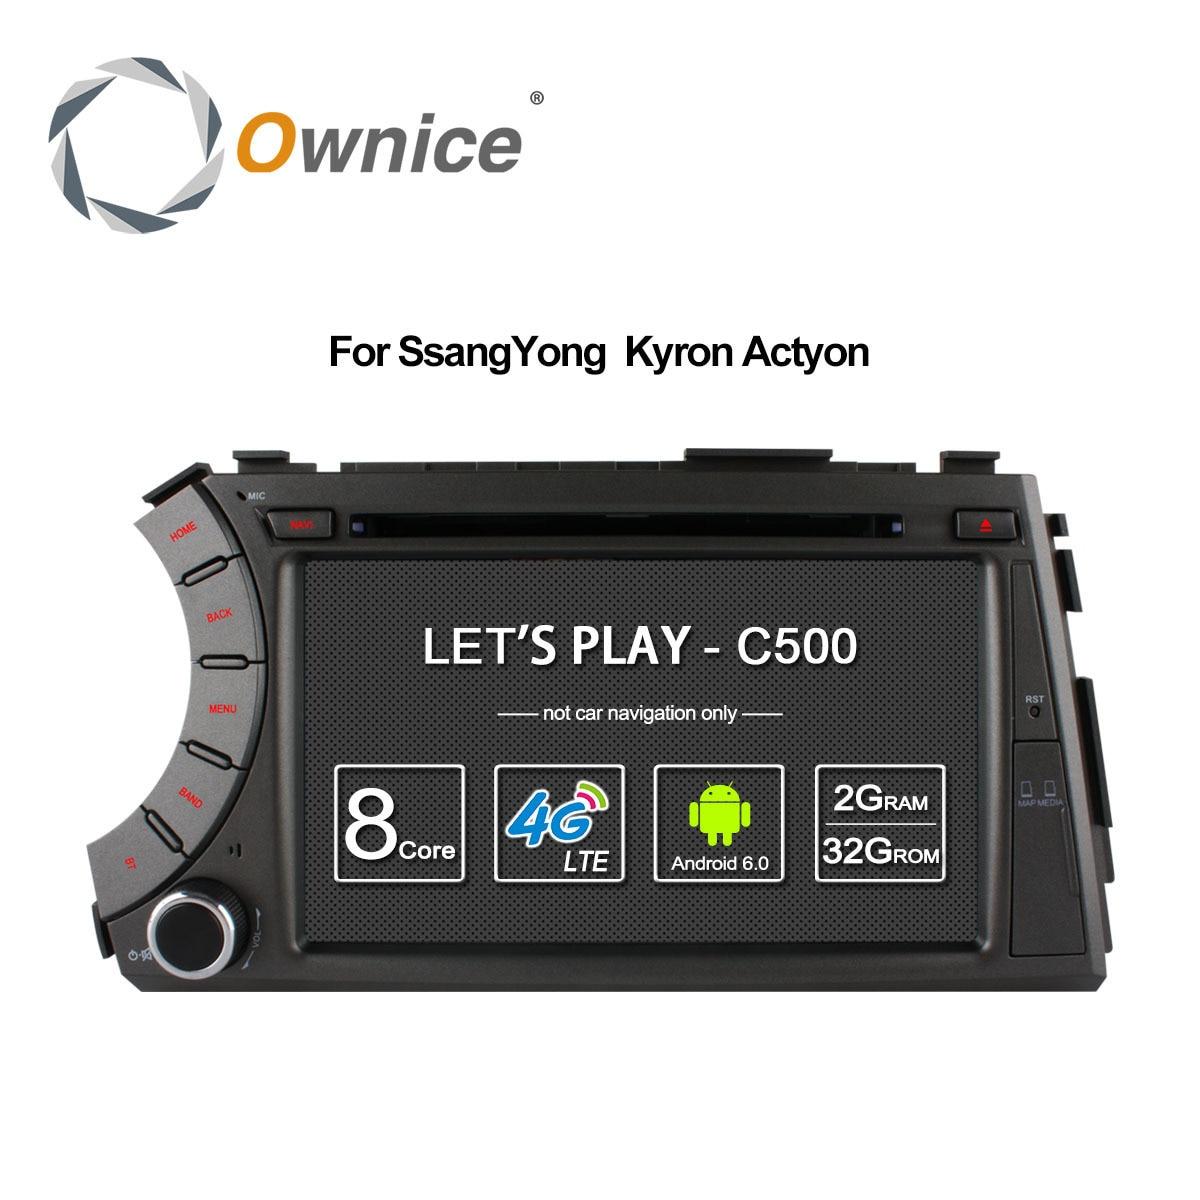 Ownice C500 4G SIM LTE Android 6 0 Octa 8 Core font b car b font